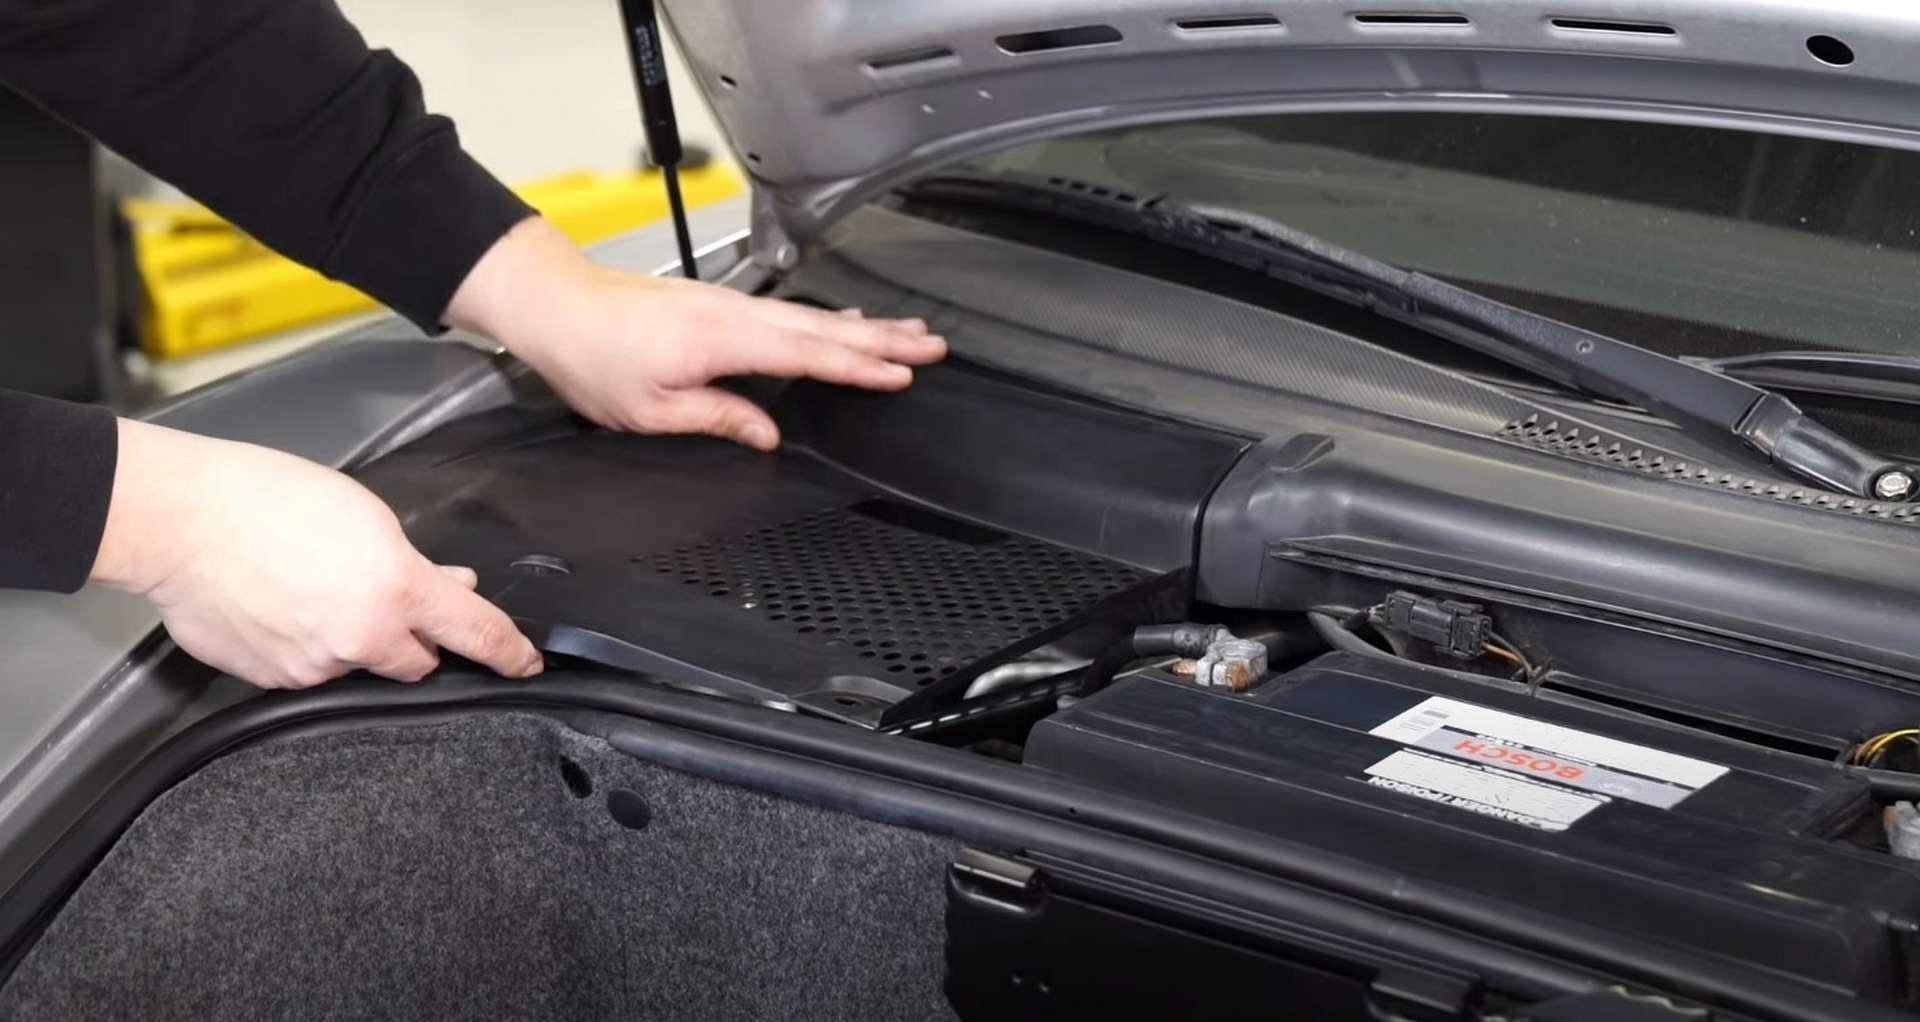 09-DIY-Porsche-996-Cabin-Filter_Refitting-Cowl